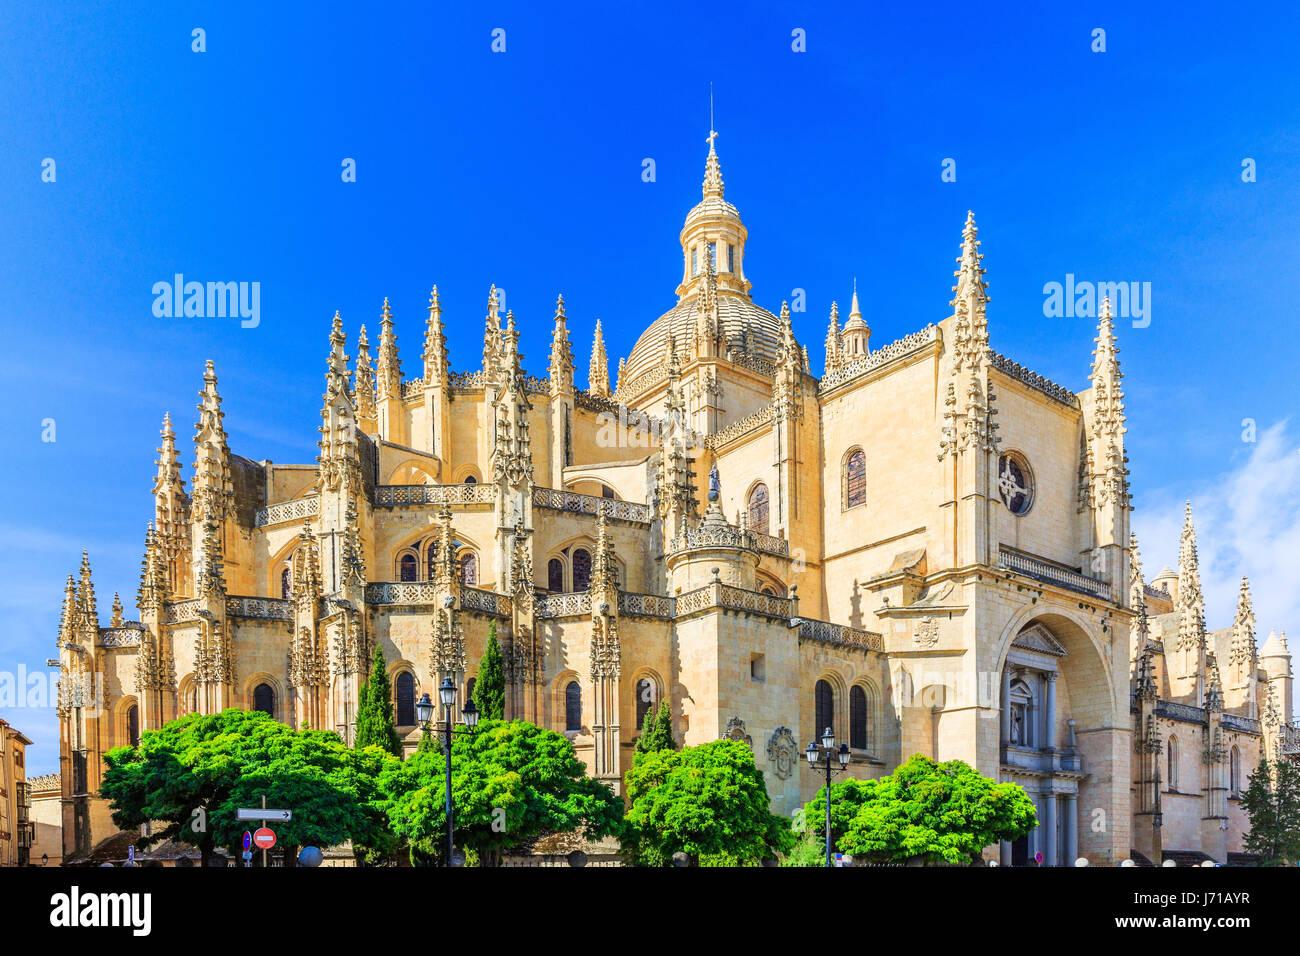 Cathedral de Santa Maria de Segovia in the historic city of Segovia, Castilla y Leon, Spain. - Stock Image